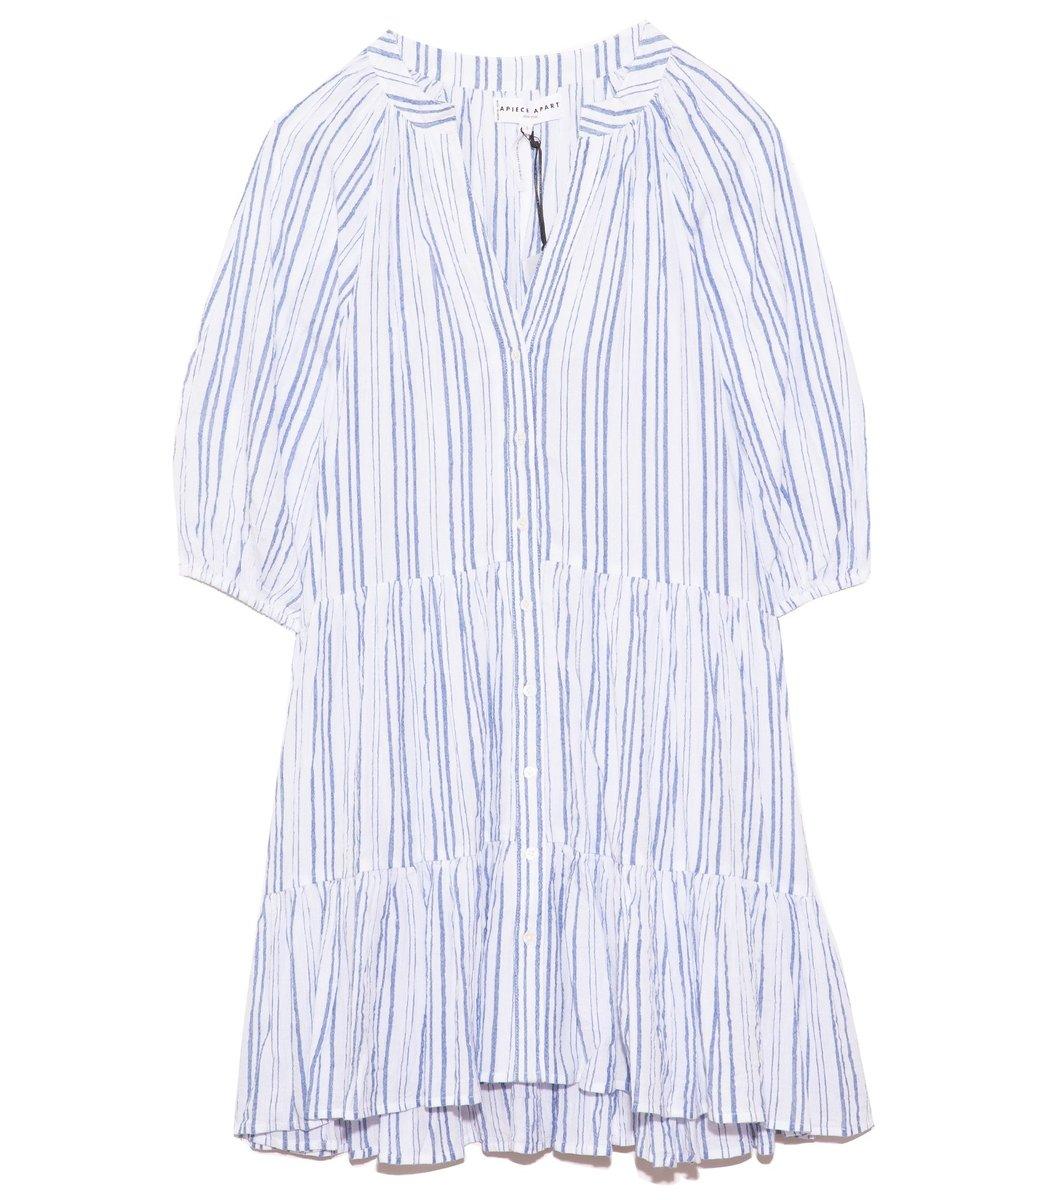 Apiece Apart Mini Mitte Dress in Stripes